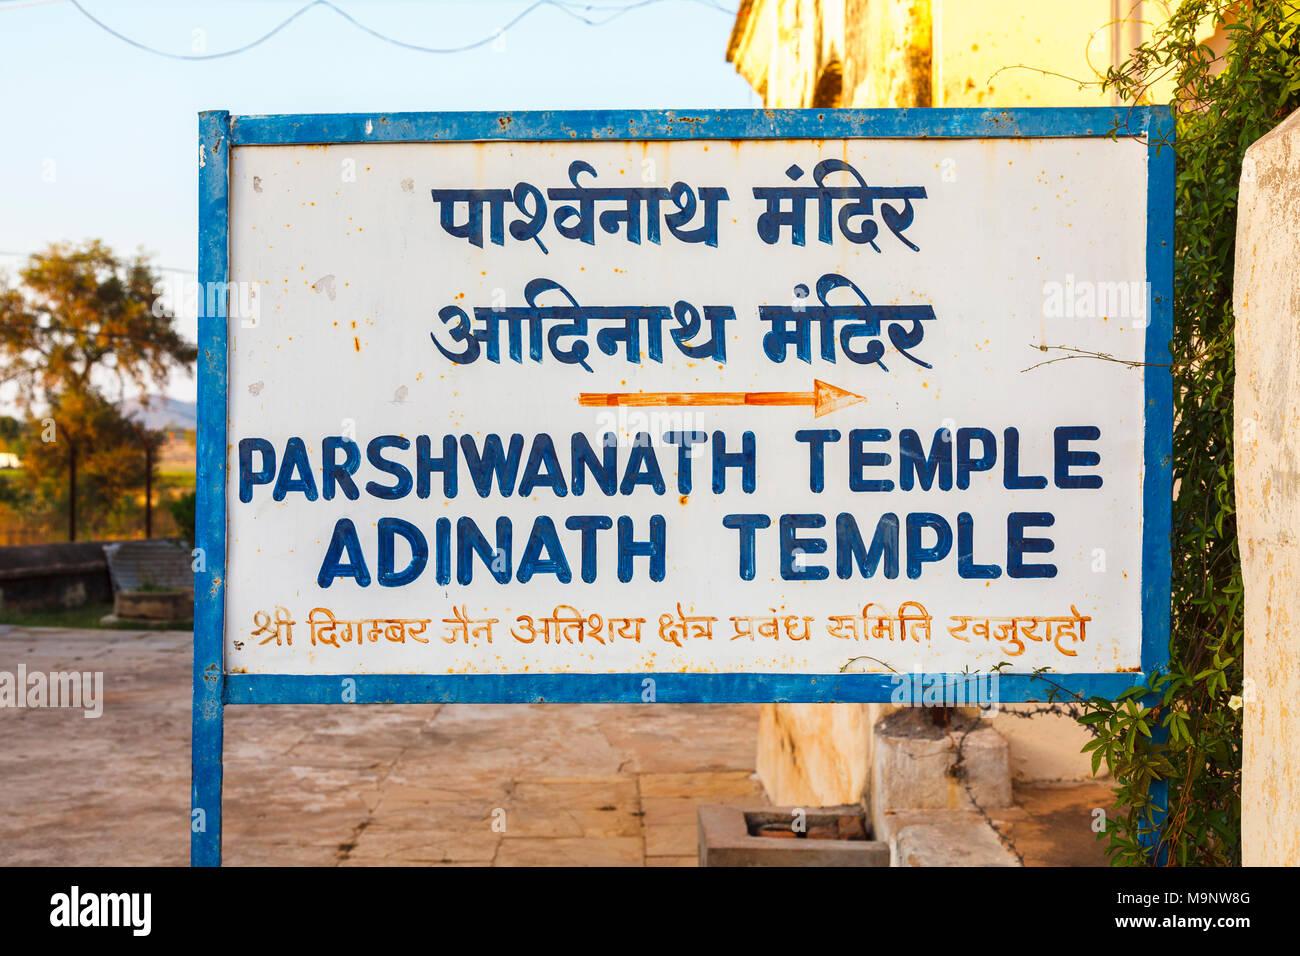 Sign to Lord Parshwanath and Adinath Jain Temples, Eastern Group of Temples, Khajuraho, Madhya Pradesh, India - Stock Image